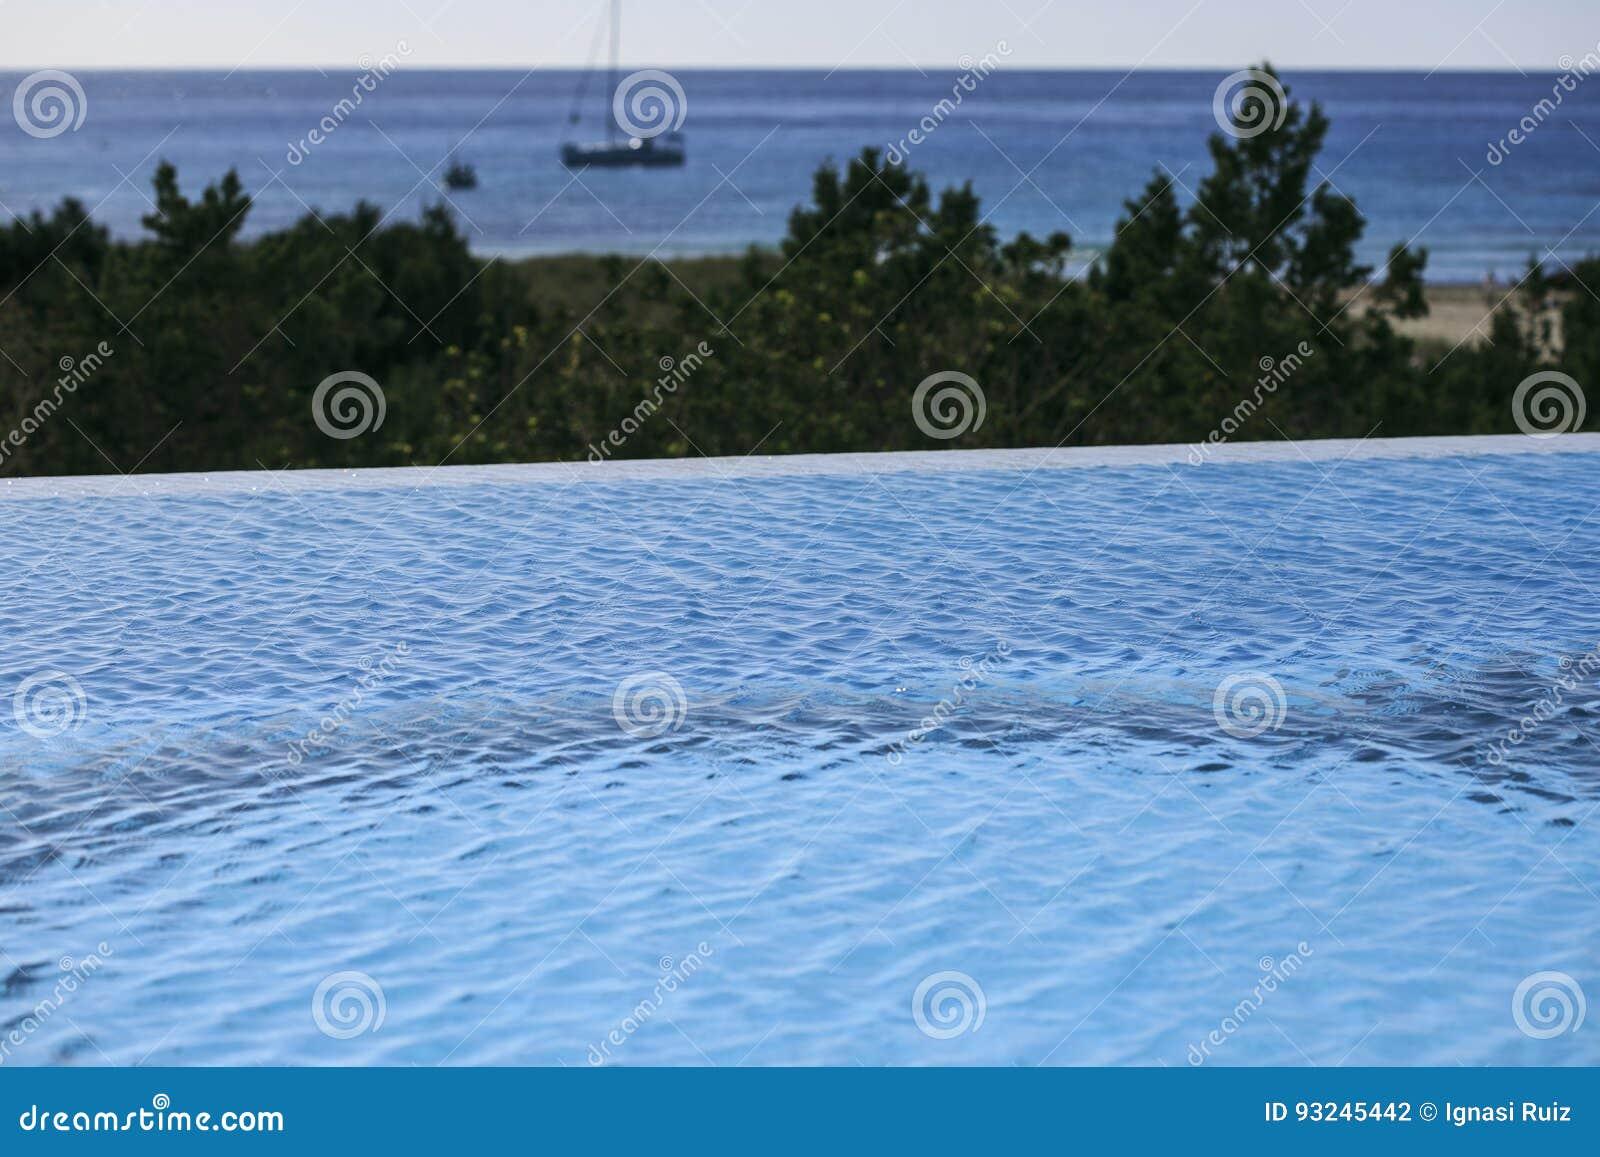 Infinite swimming pool stock photo. Image of beauty, healthy - 93245442